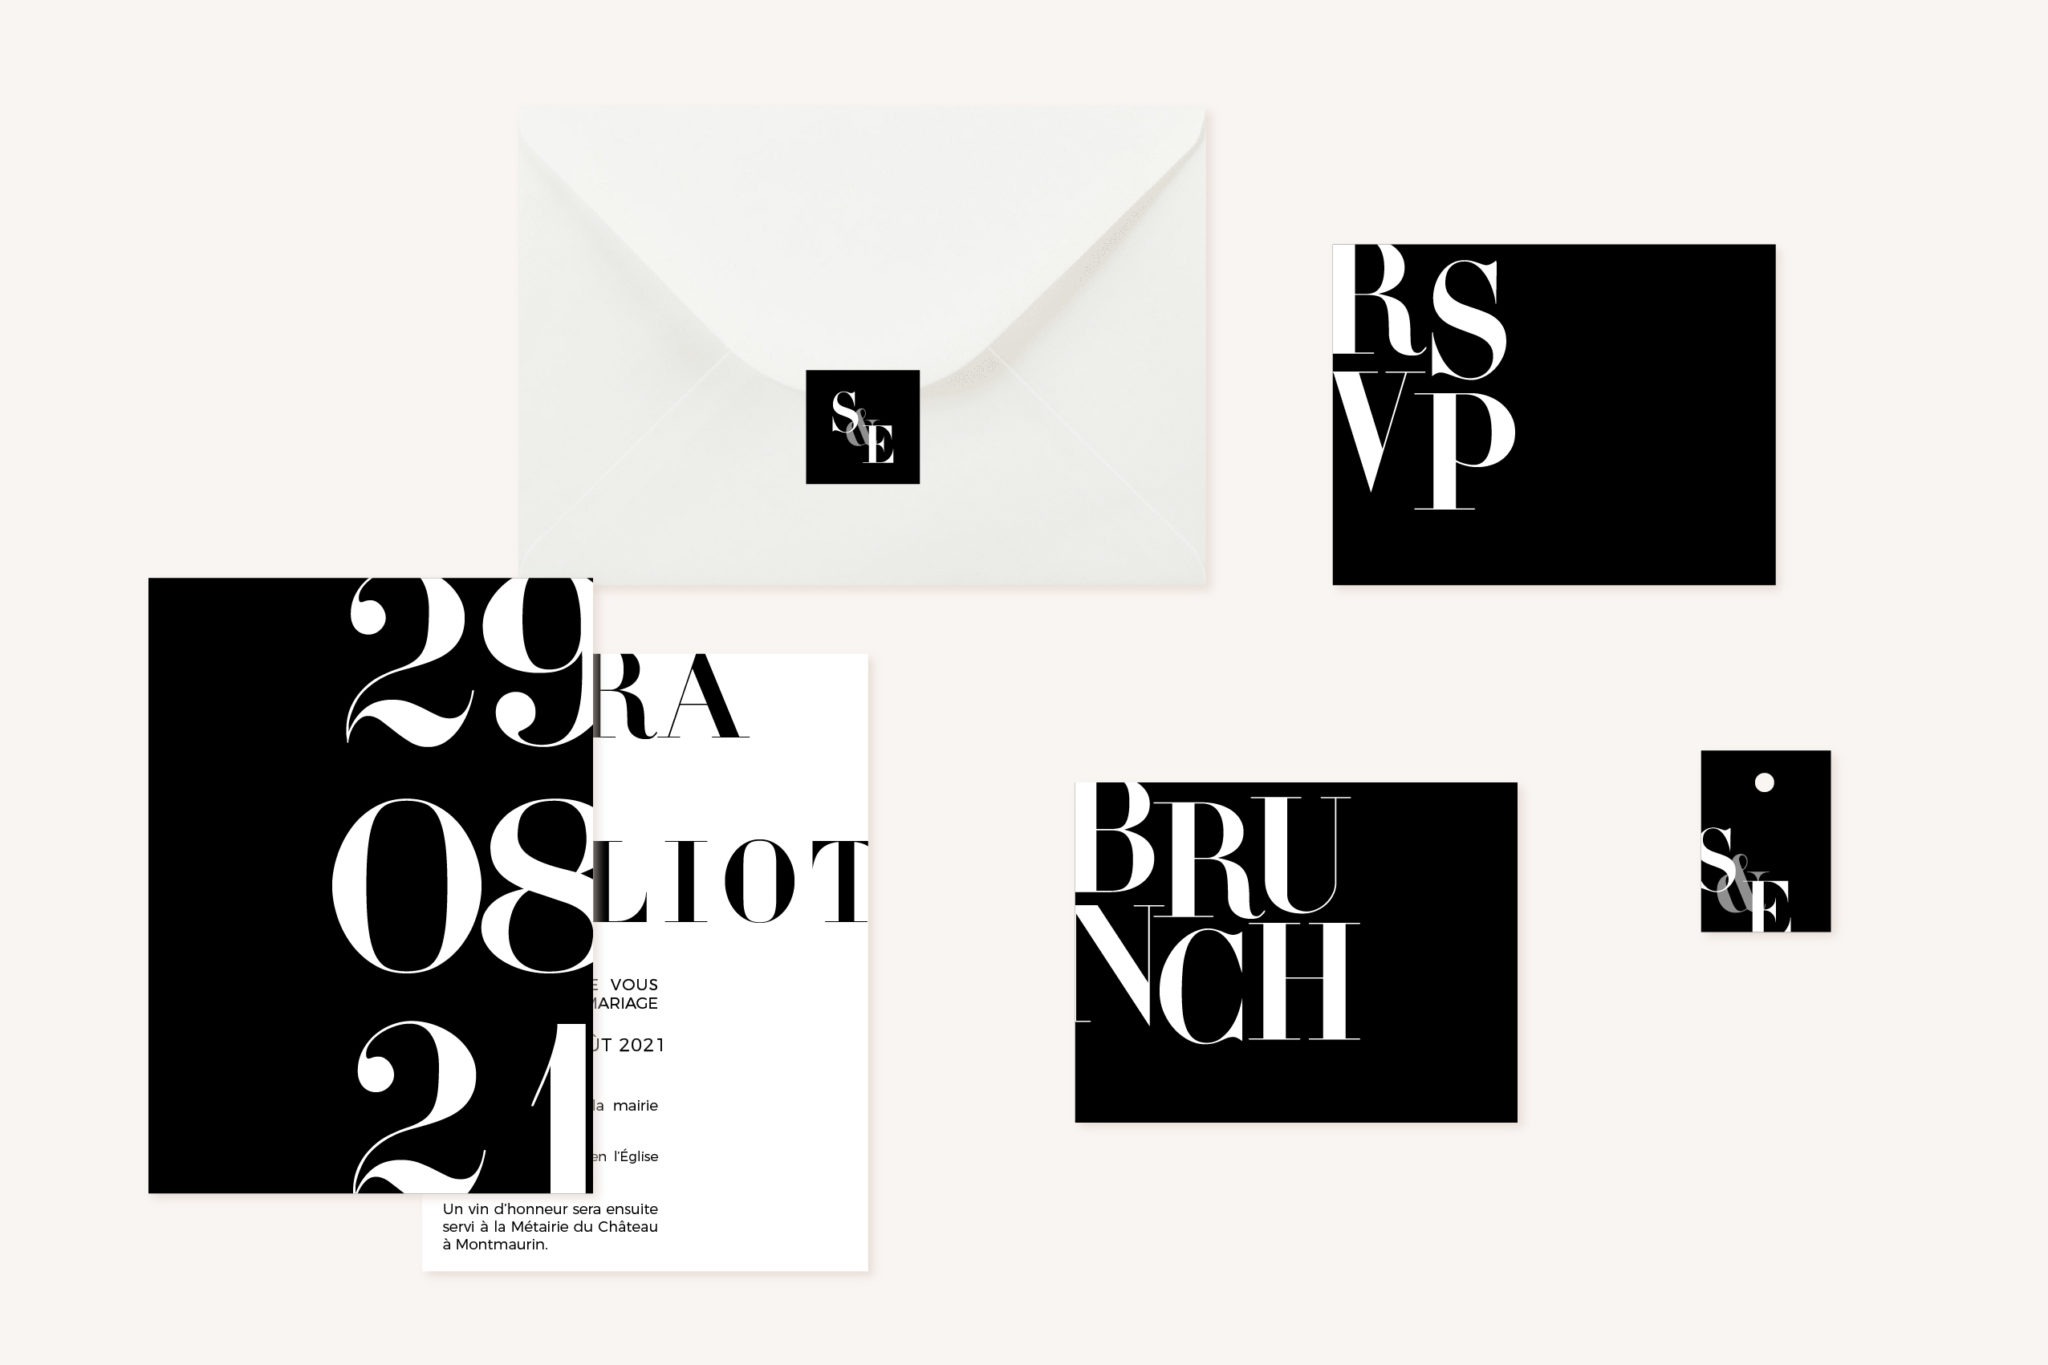 Collection black and white noir et blanc moderne lettering innovant graphique